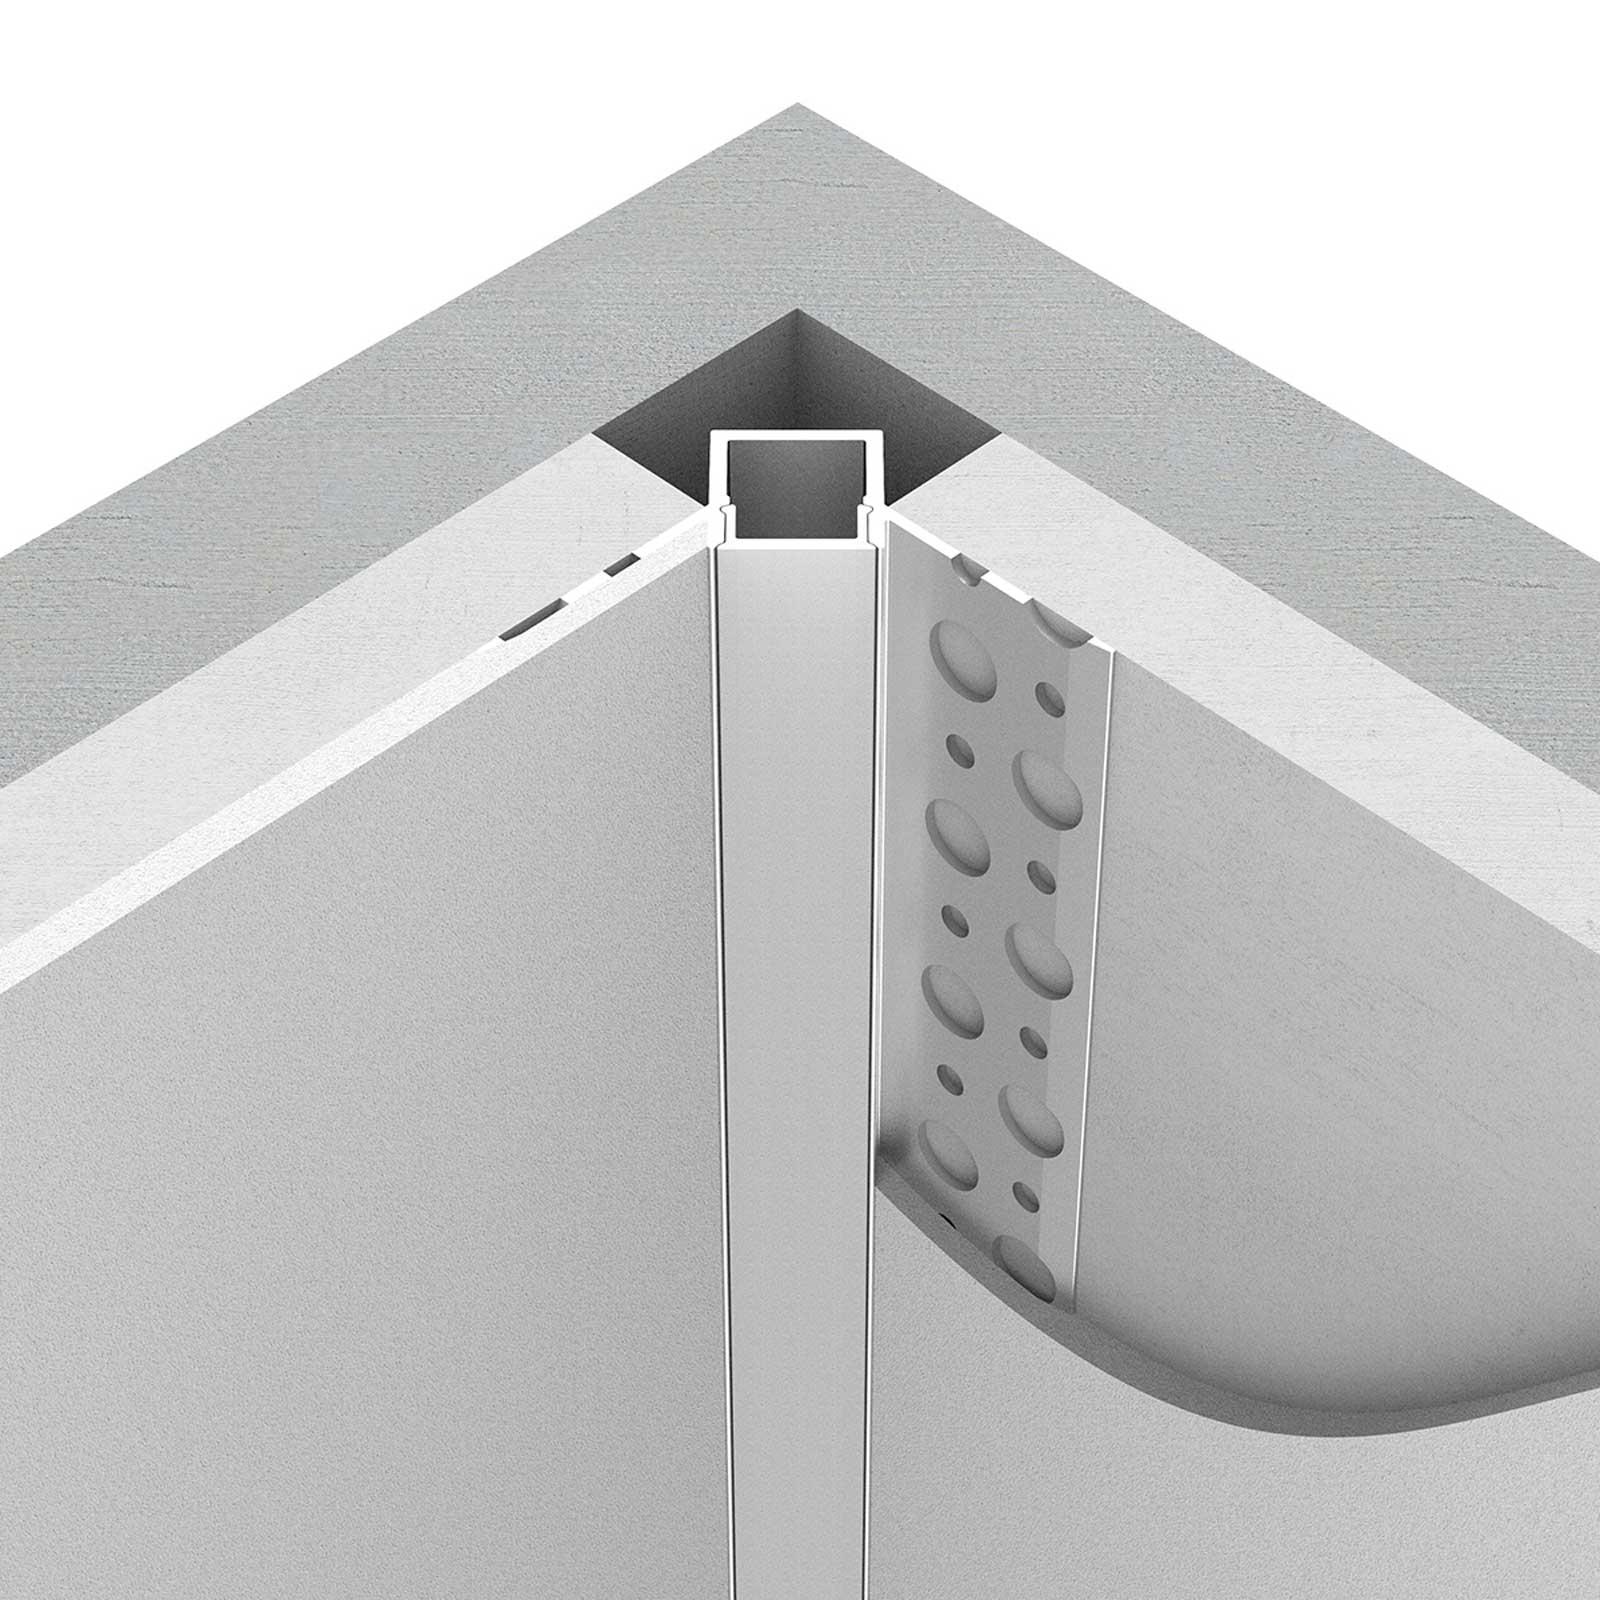 Montage 2 Meter LED Inneneck-Aluprofil ONUR (ON) für Trockenbau Rigipswand